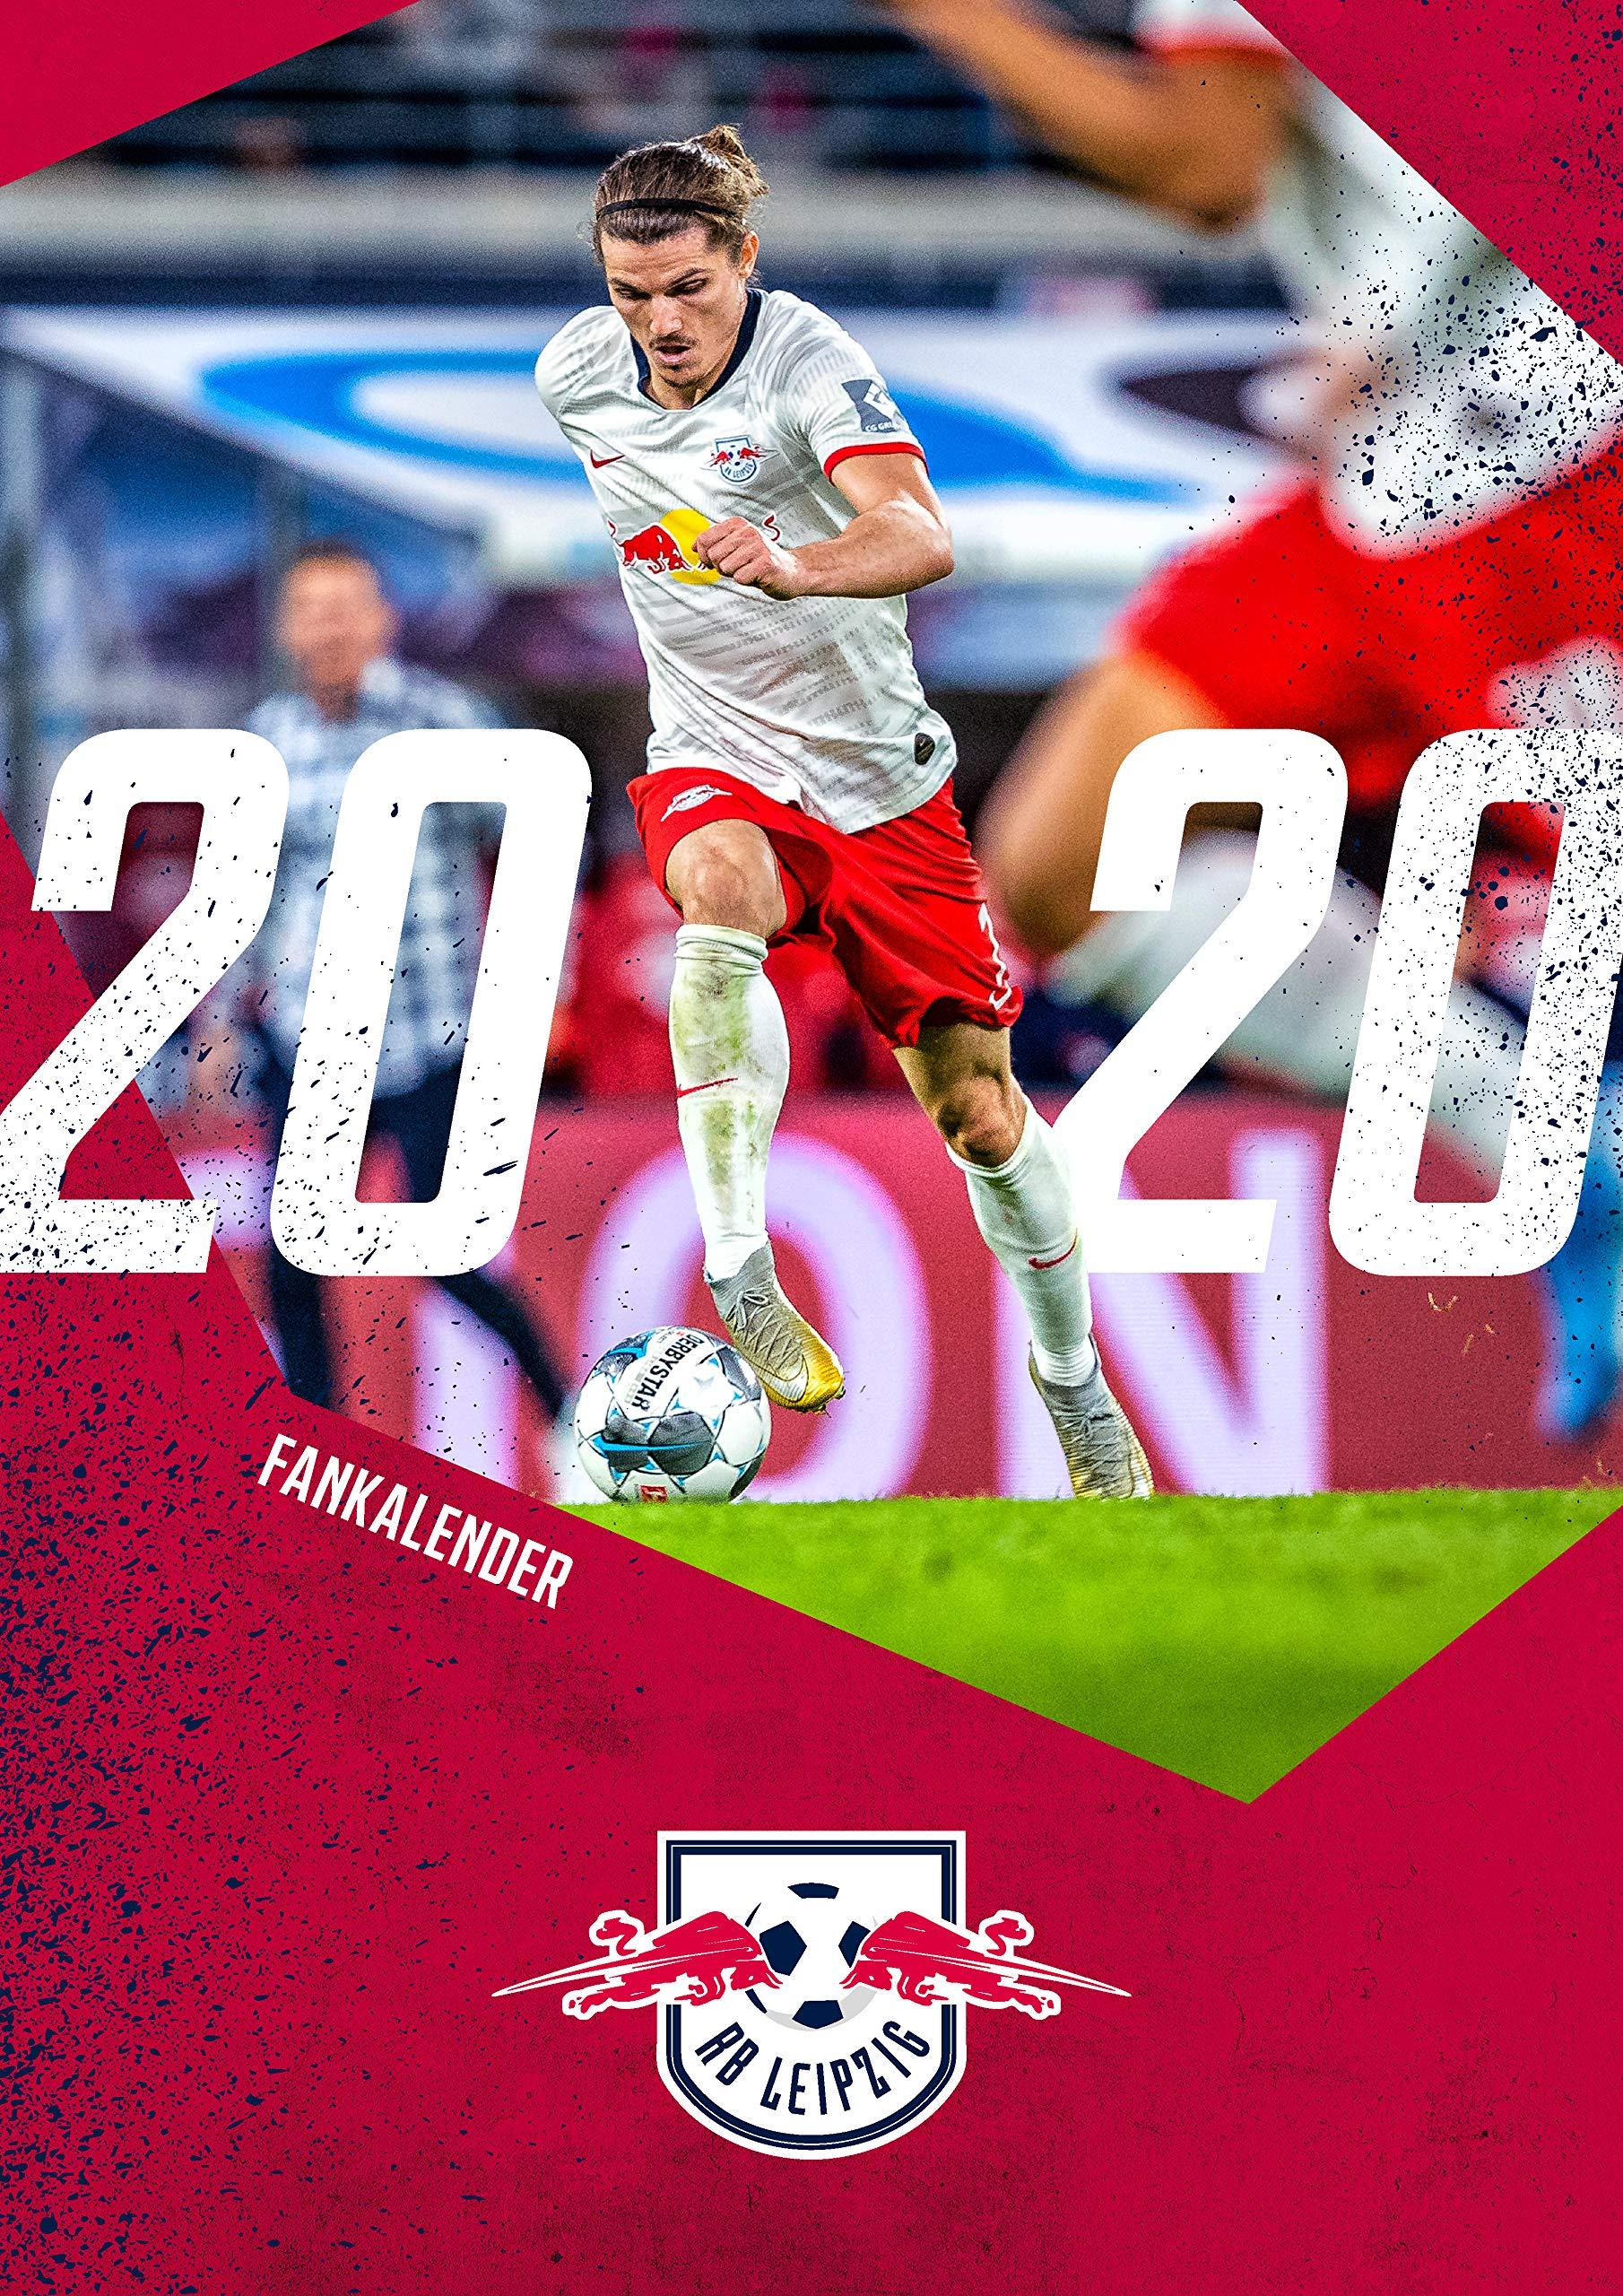 Rb Leipzig 2020 Fankalender 9783710500350 Amazon Com Books